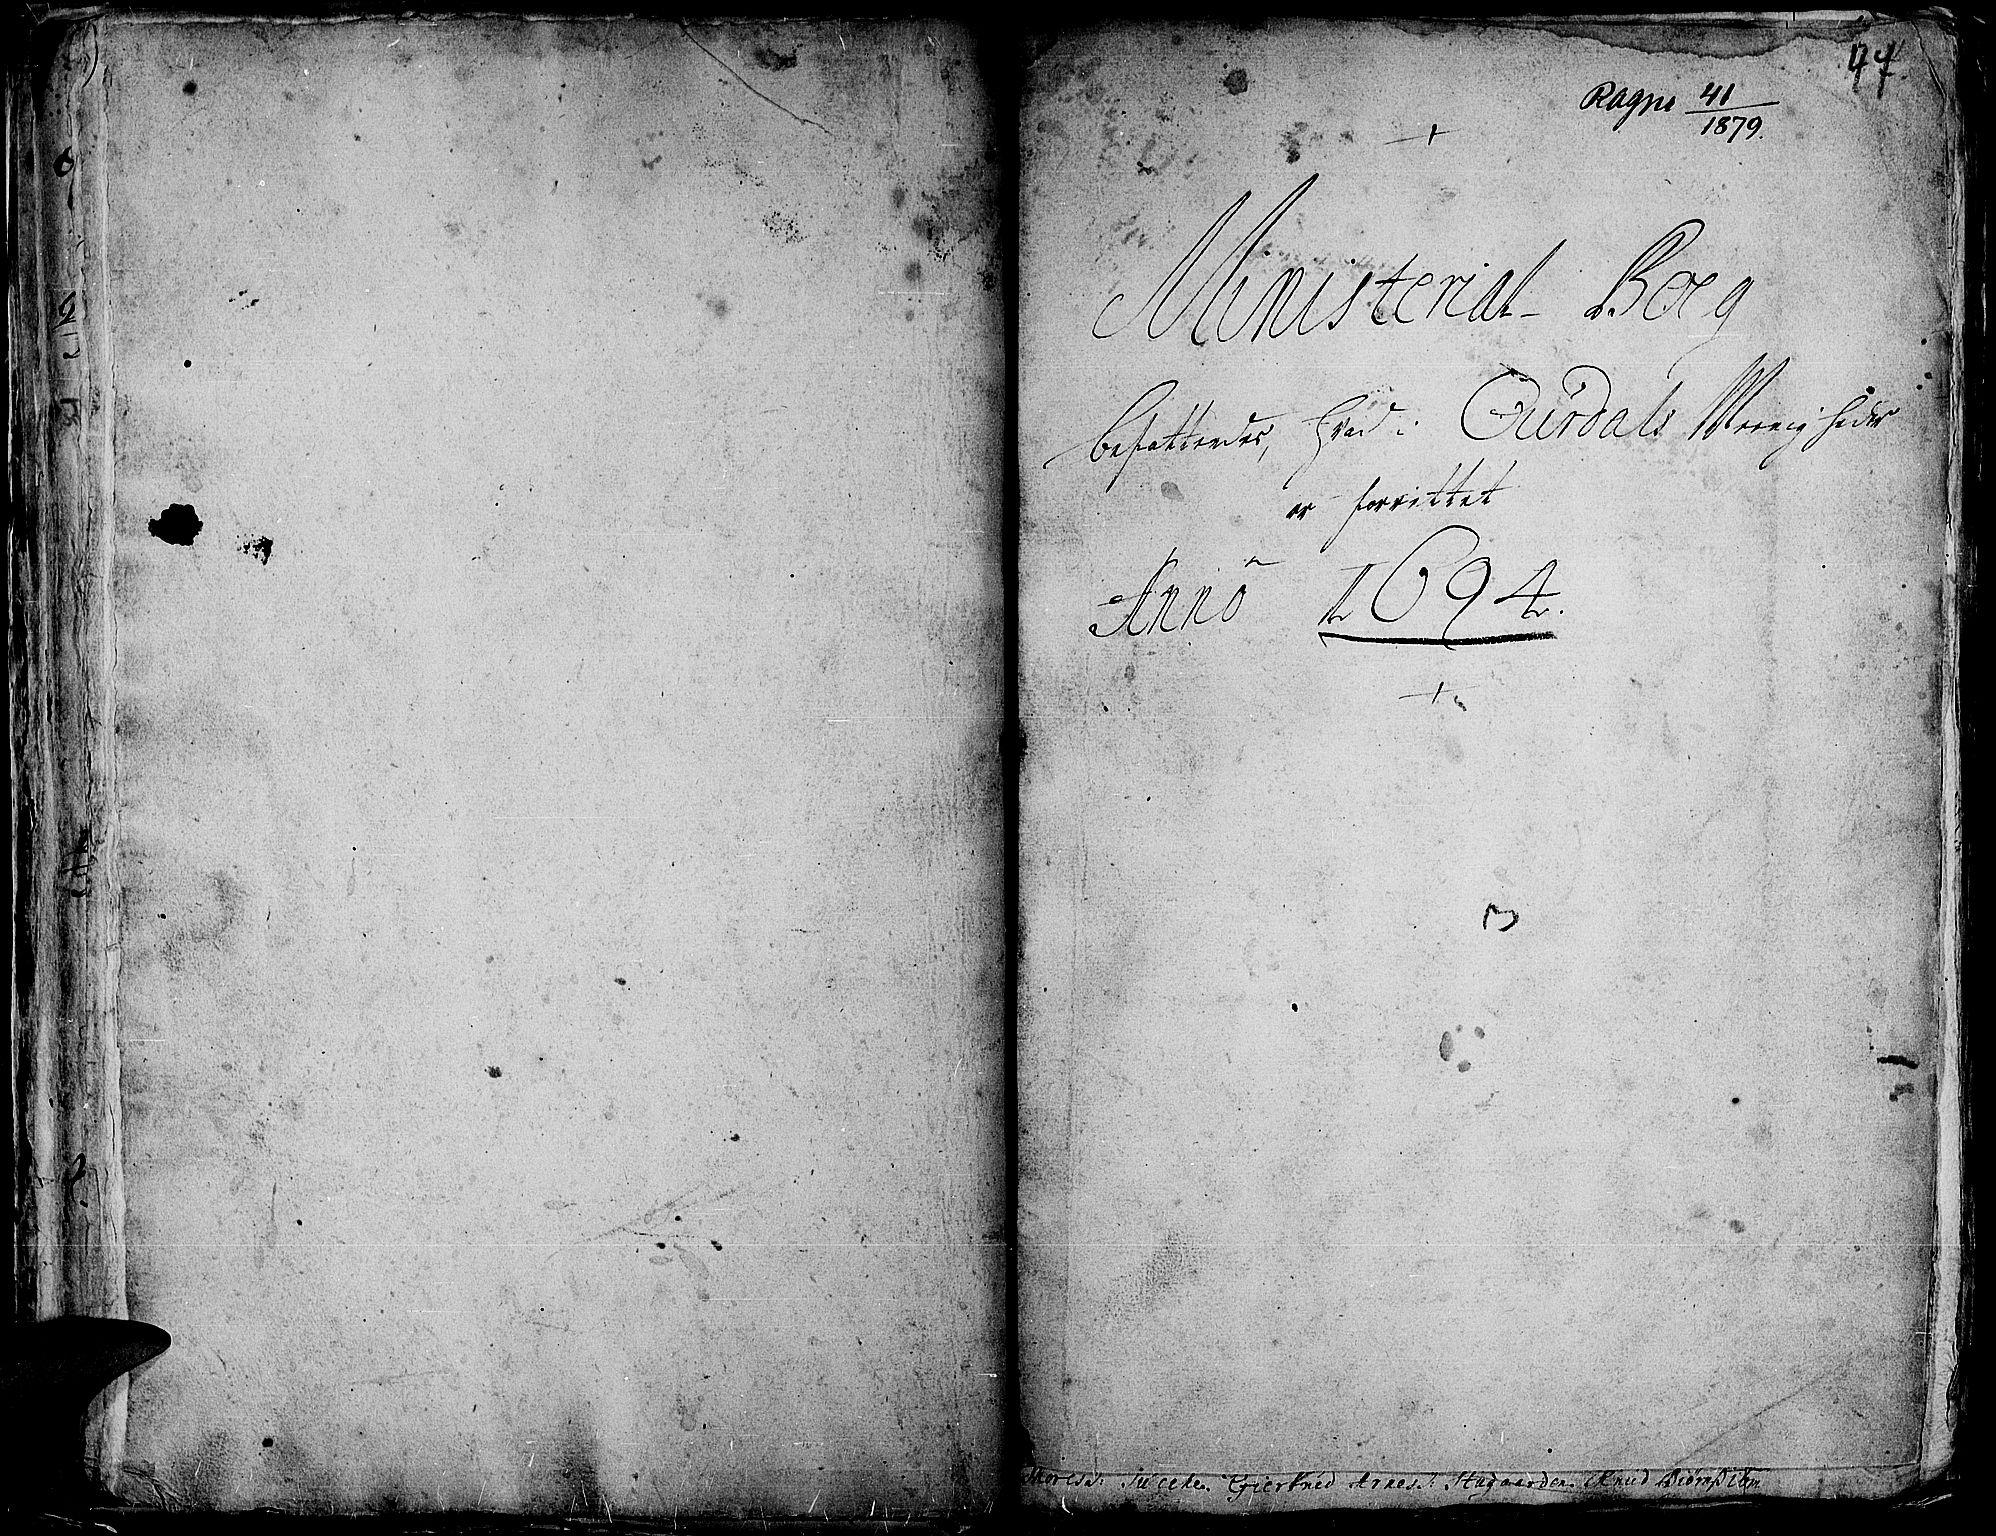 SAH, Aurdal prestekontor, Ministerialbok nr. 1-3, 1692-1730, s. 47